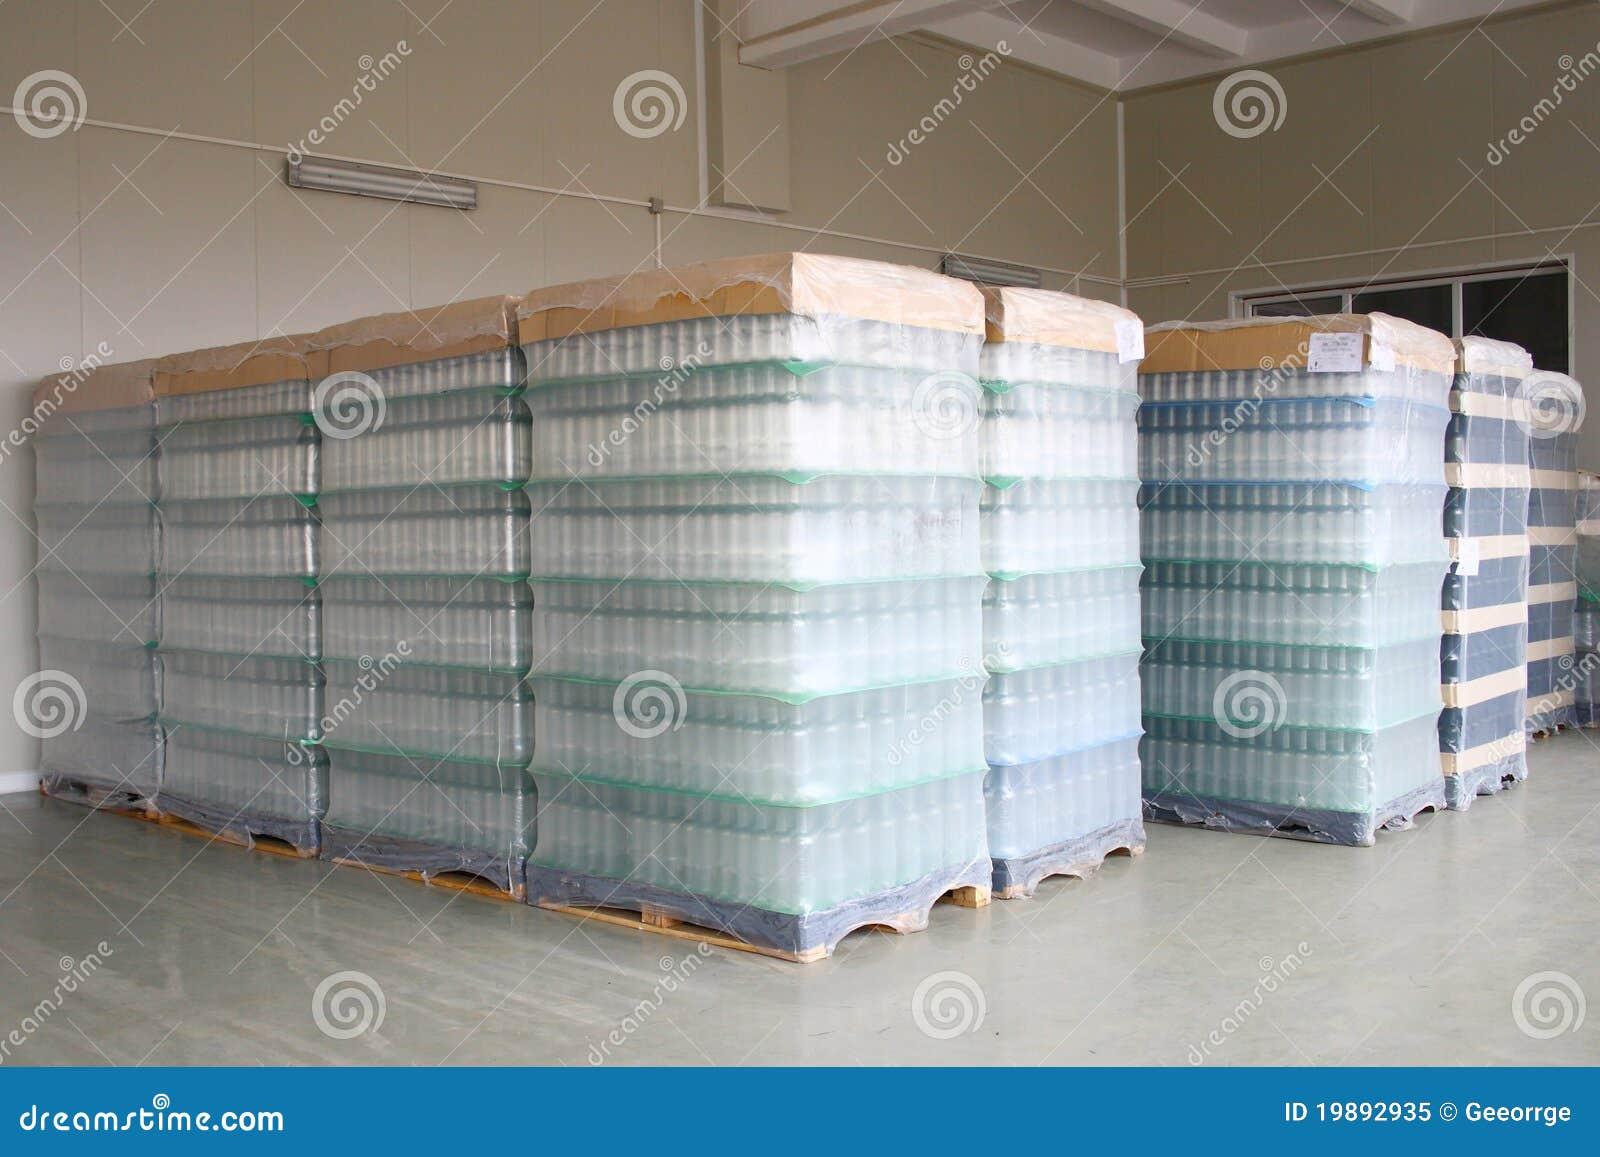 Flaschen gespeichert im Depot